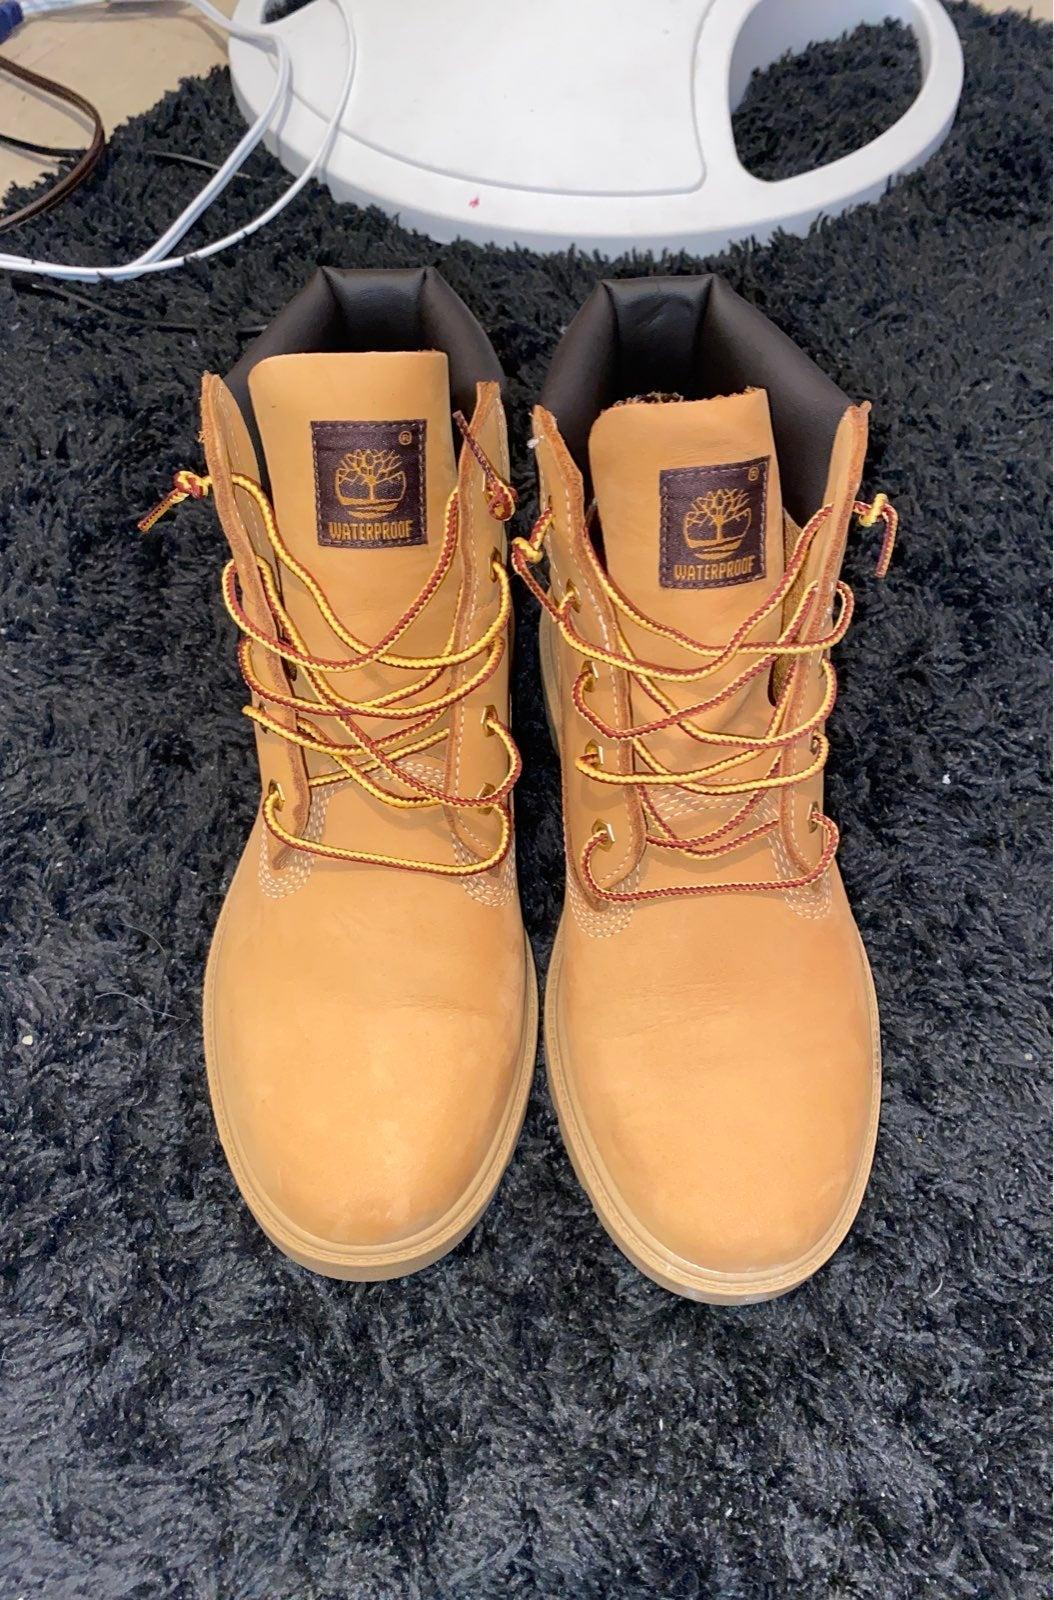 Timberland boots GS (waterproof)